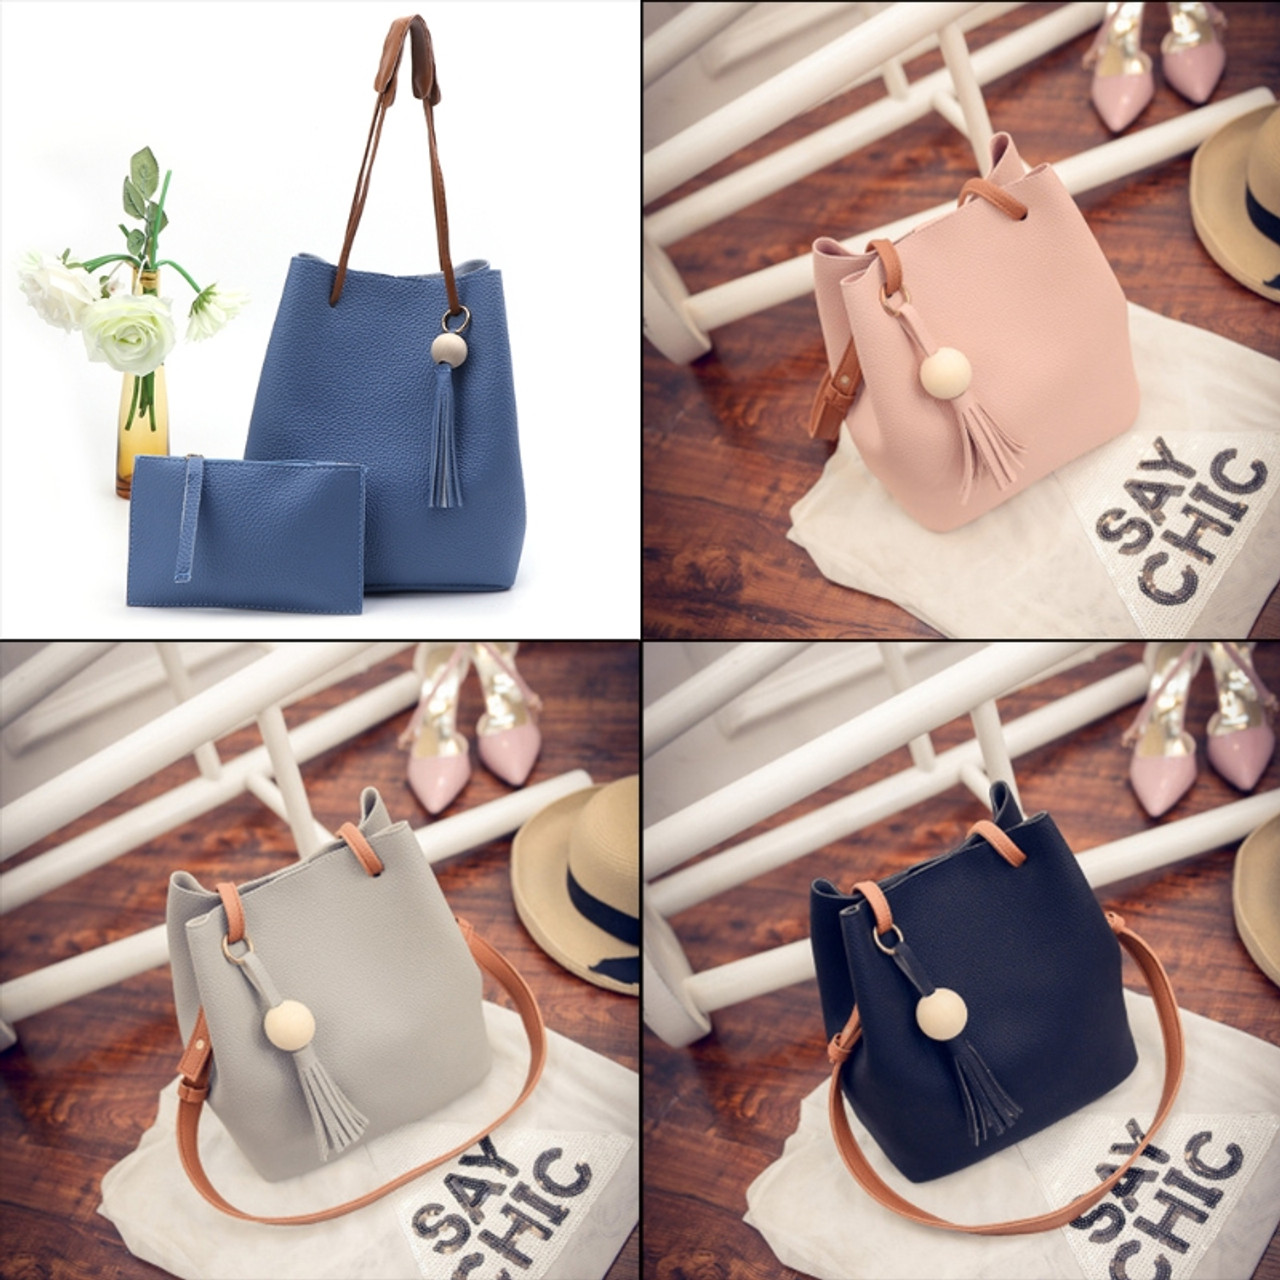 96b89ab833cc ... THINKTHENDO New 2pcs Women Leather Handbag Fashion Crossbody Bags  Shoulder Bag Tote Small Purse Messenger Clutch ...